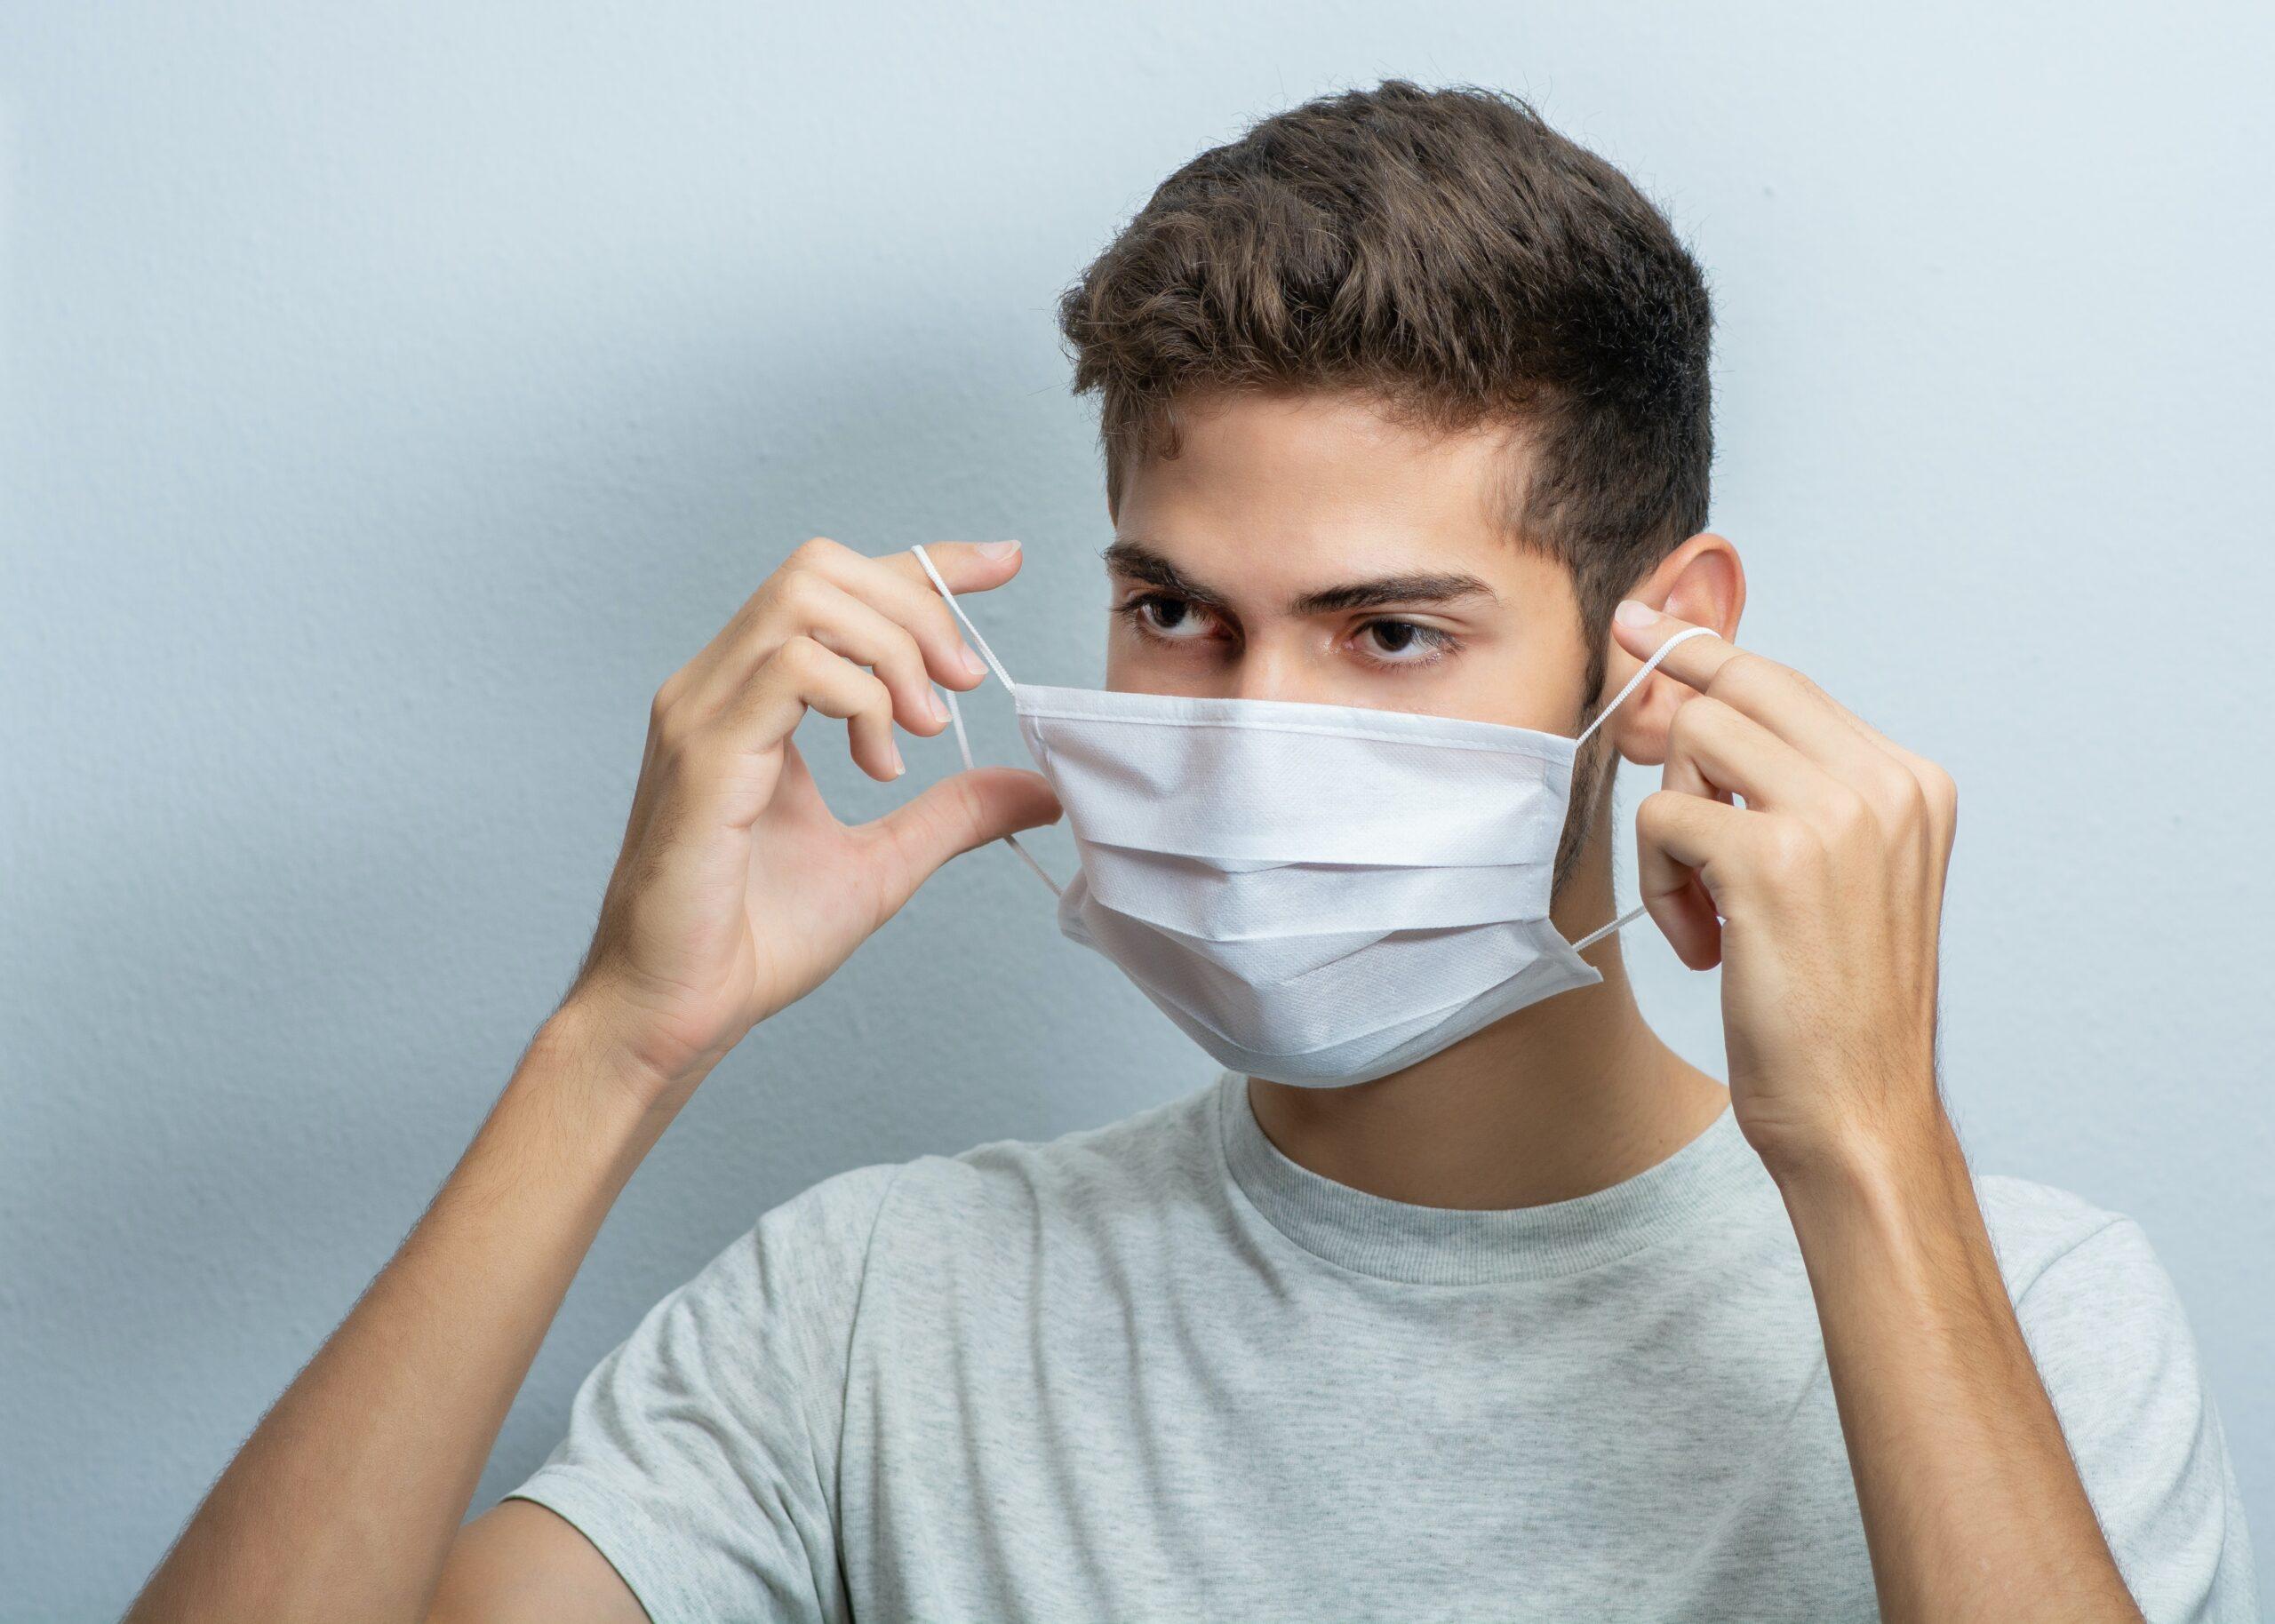 Livermore Coronavirus COVID-19 Pandemic Tenant Eviction Moratorium Extended September 30 2020